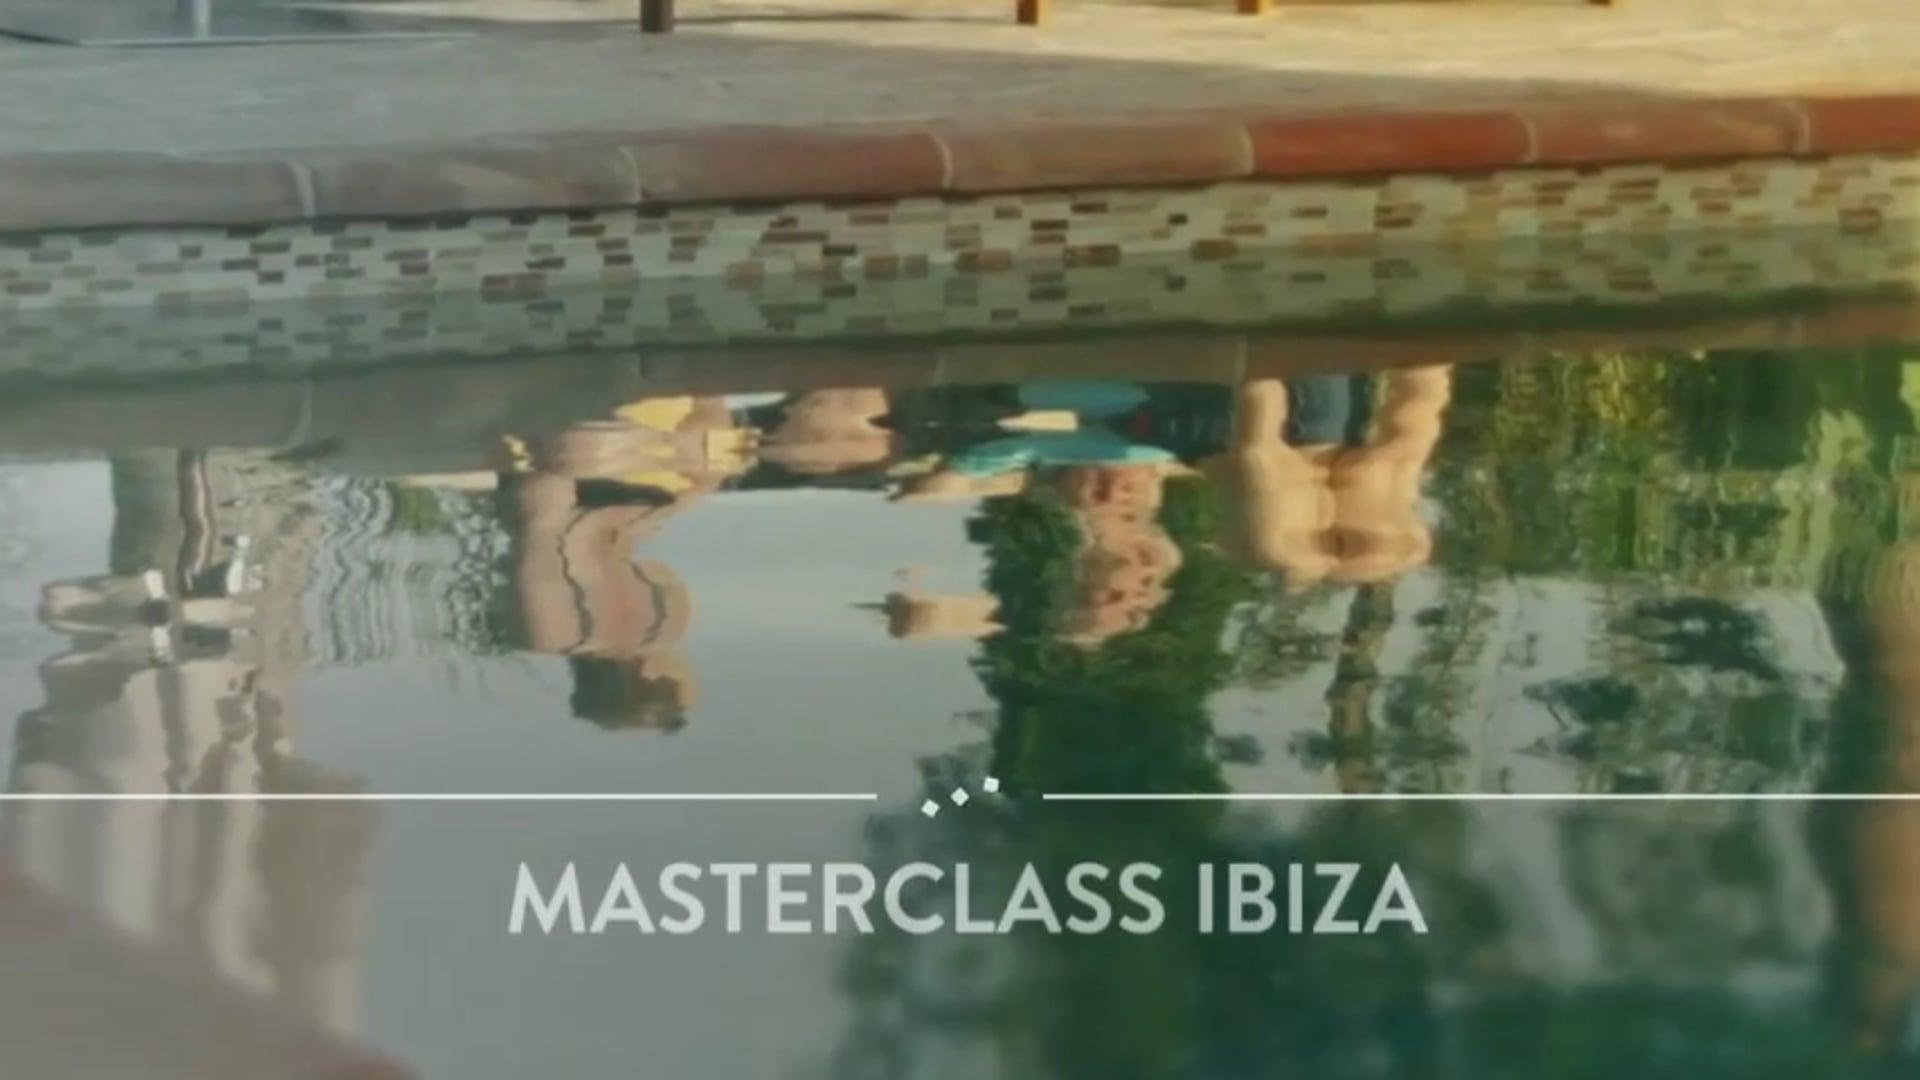 Masterclass Ibiza